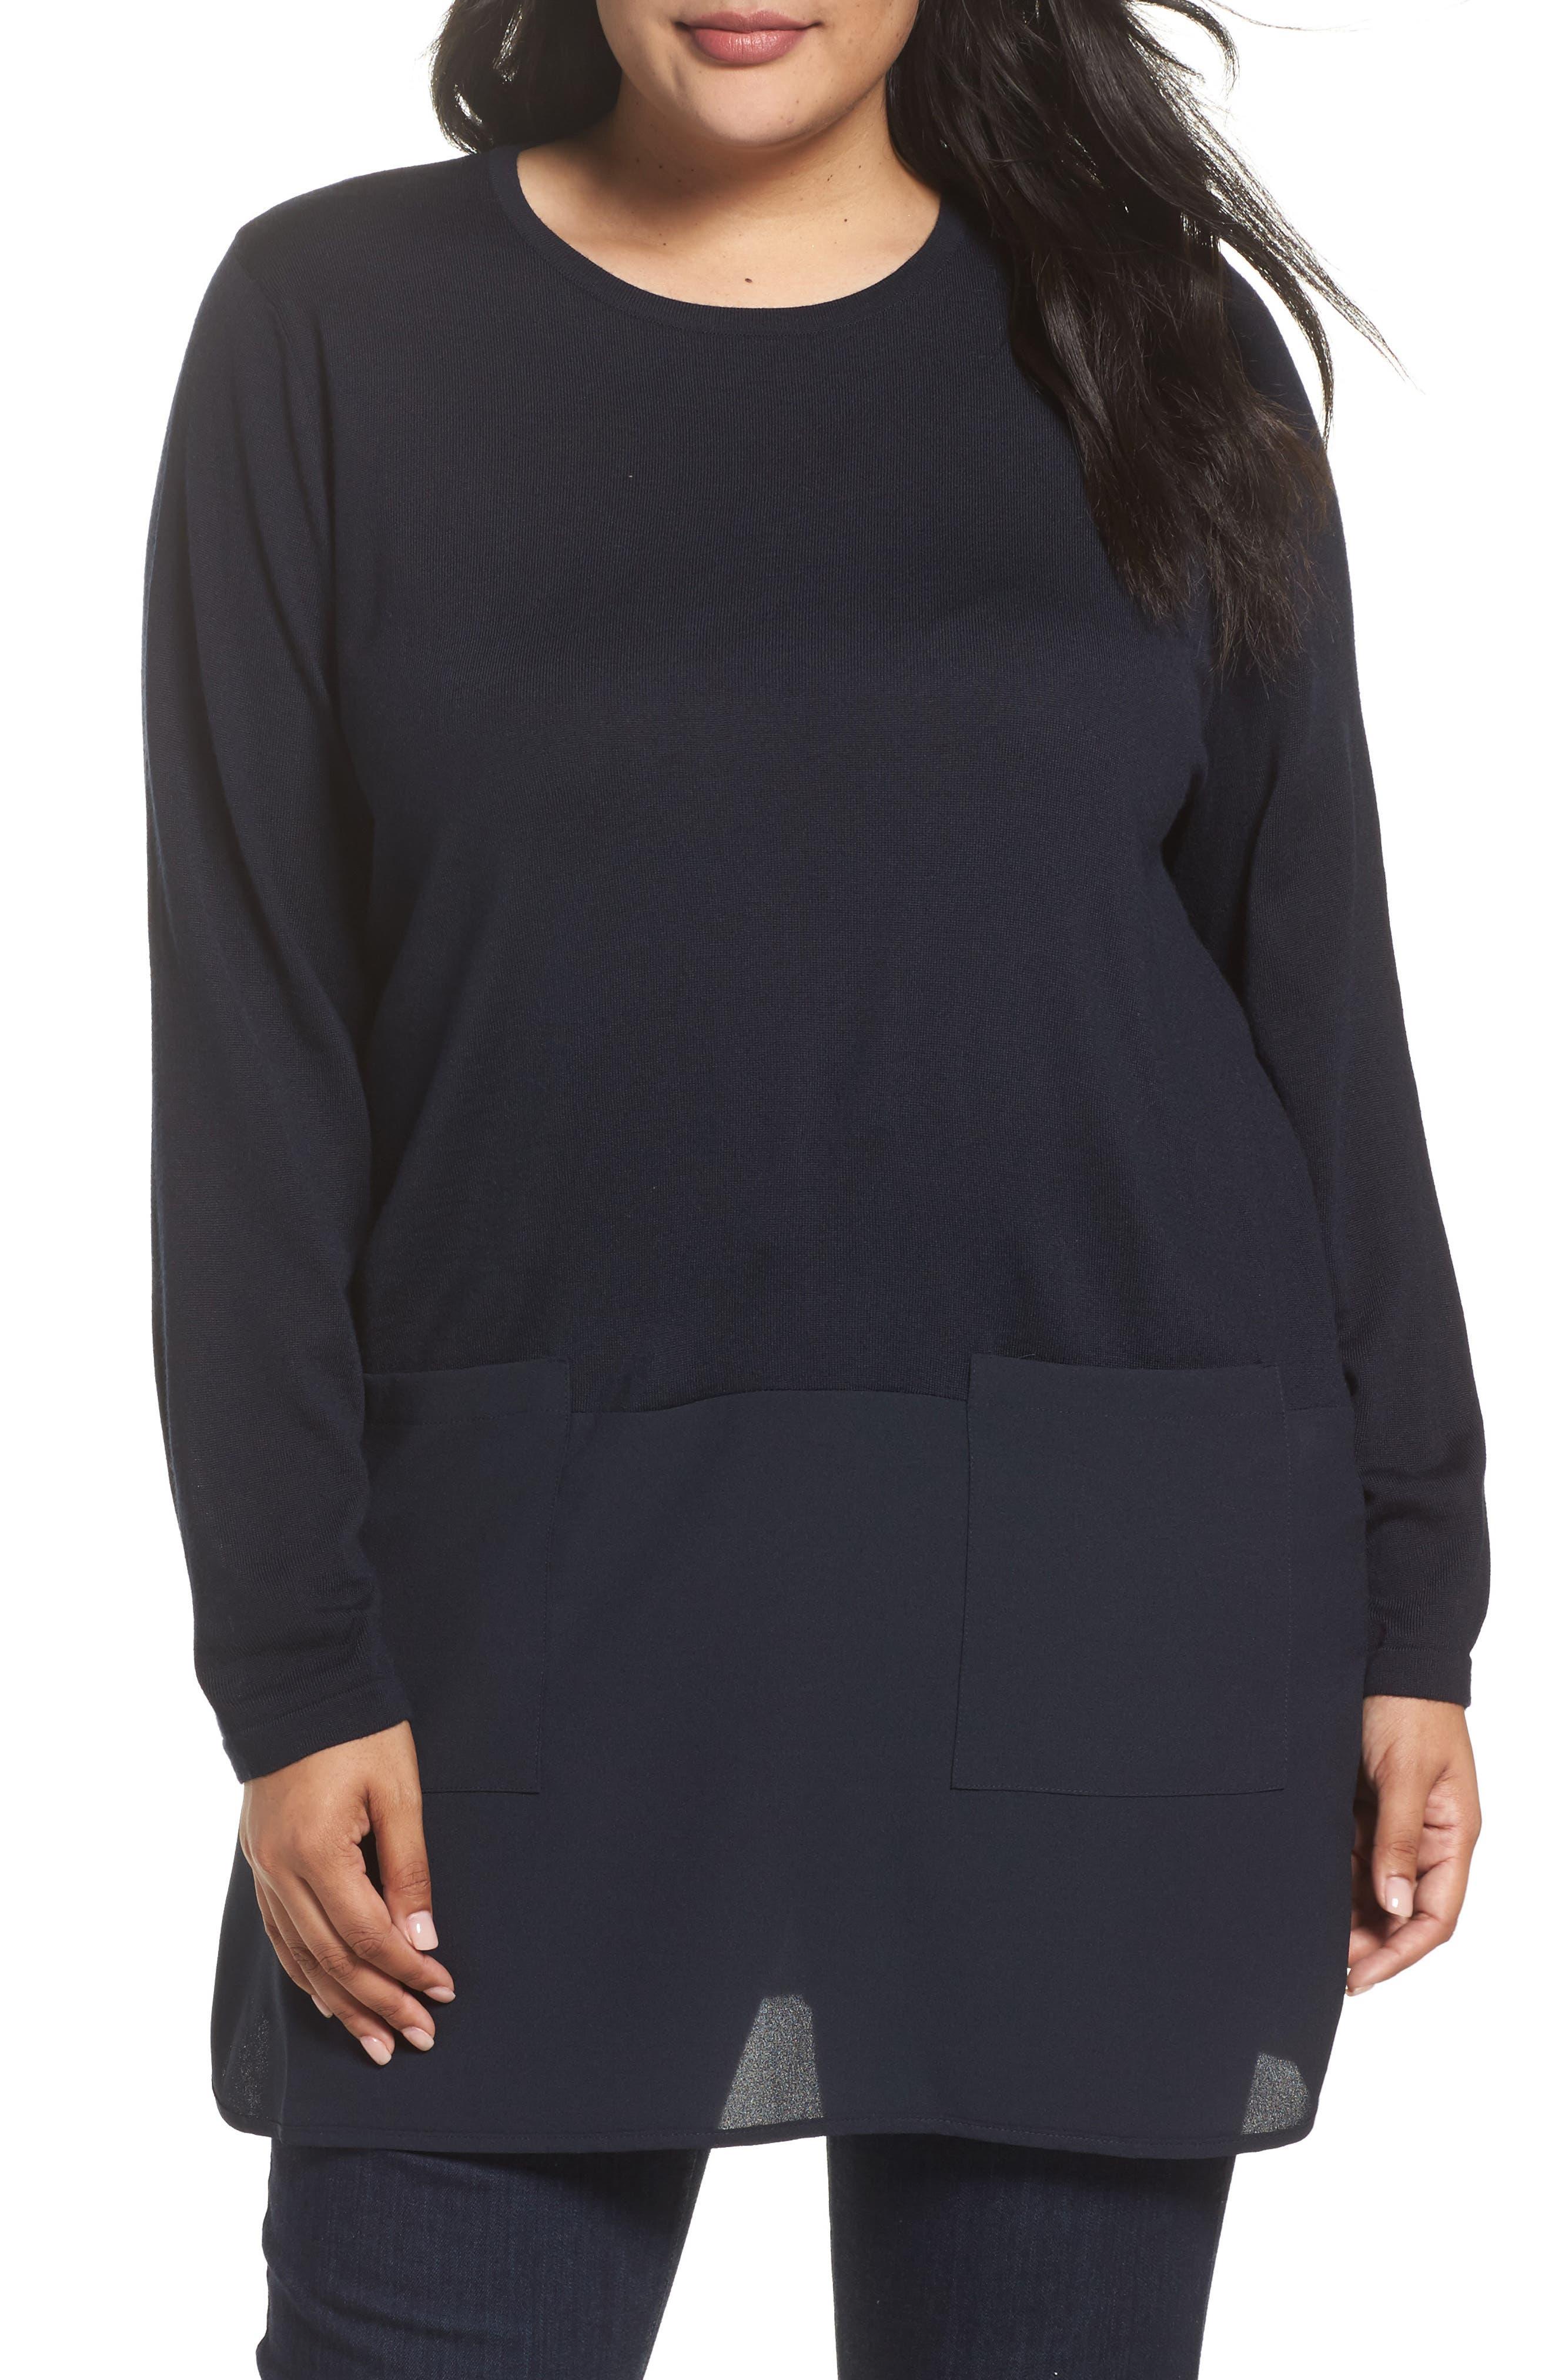 Alternate Image 1 Selected - Persona by Marina Rinaldi Adamo MIxed Media Sweater (Plus Size)